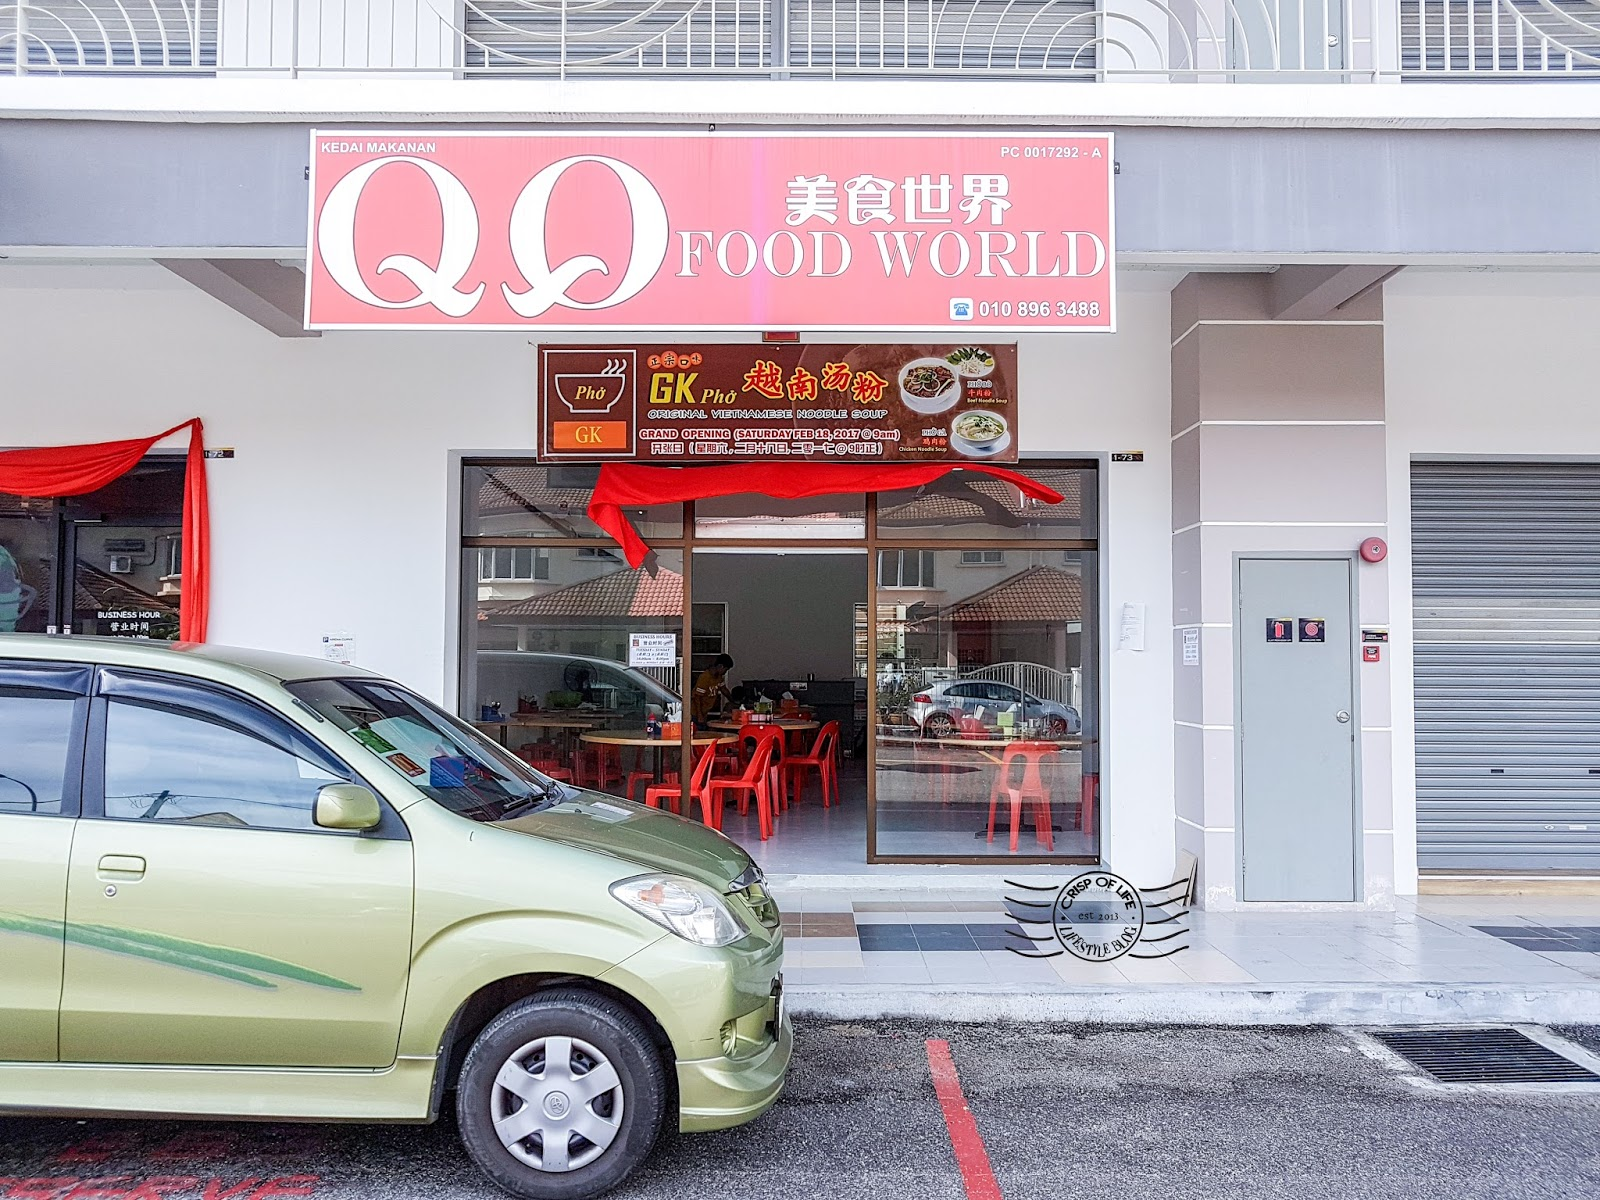 GK Pho Original Vietnamese Noodle Soup Arena Curve Bayan Baru